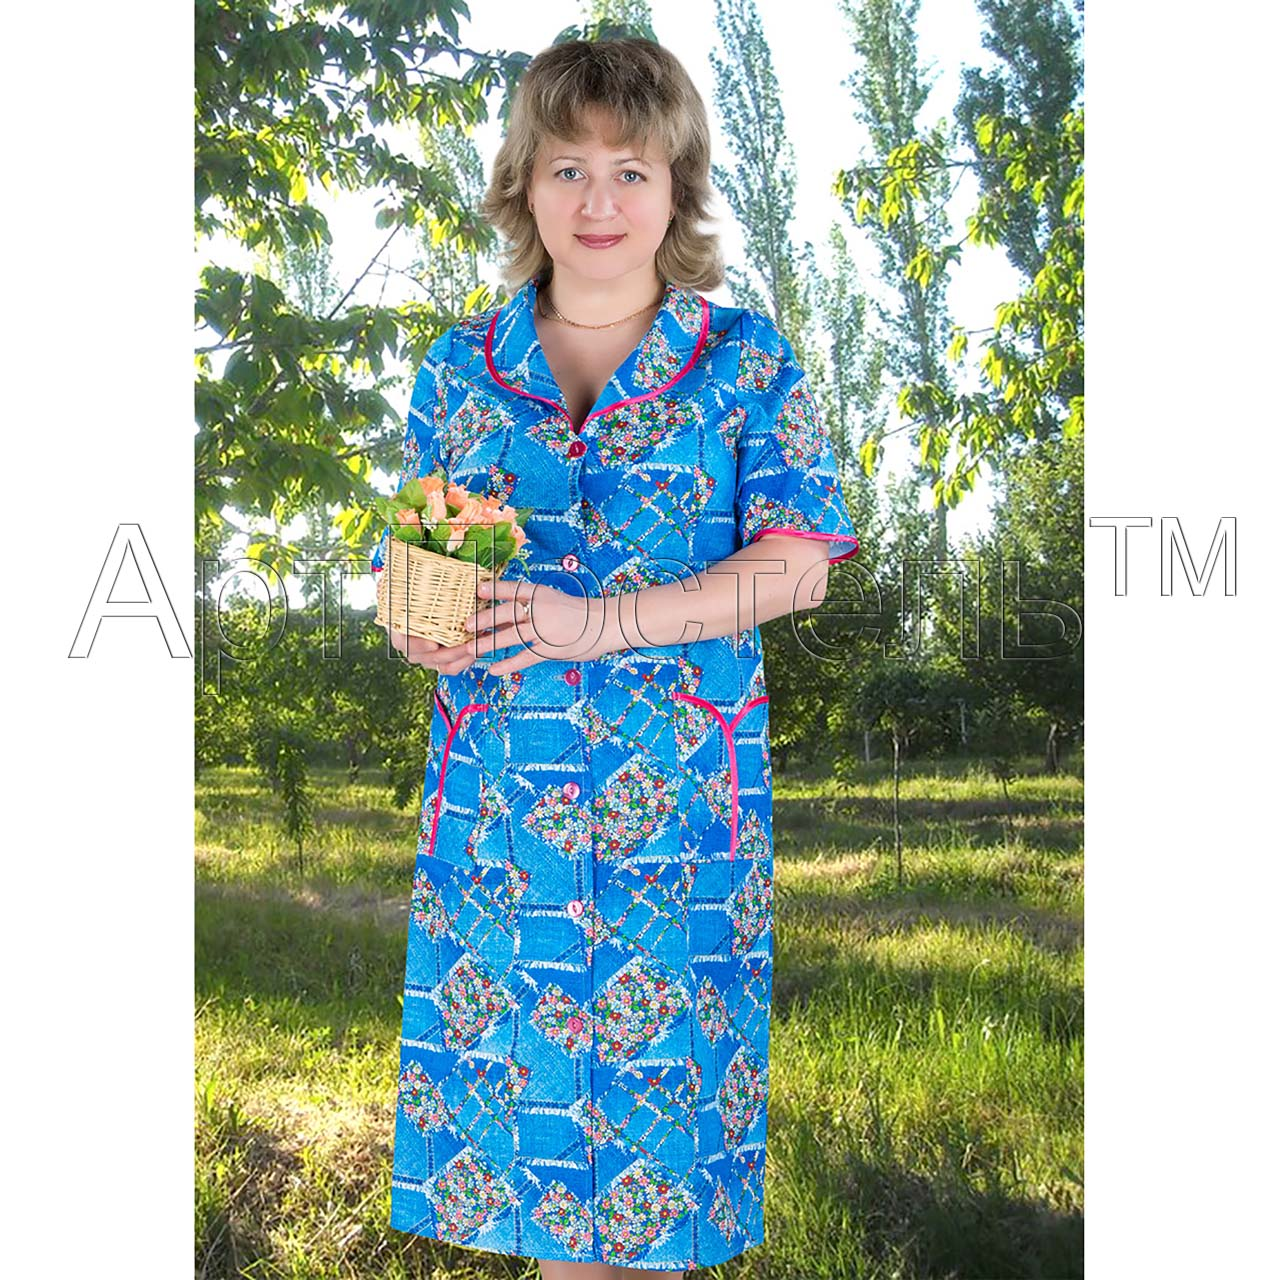 Женский халат Американка на пуговицах, размер 46Распродажа<br>Обхват груди:92 см<br>Обхват талии:73 см<br>Обхват бедер:100 см<br>Рост:164-170 см<br><br>Тип: Жен. халат<br>Размер: 46<br>Материал: Бязь